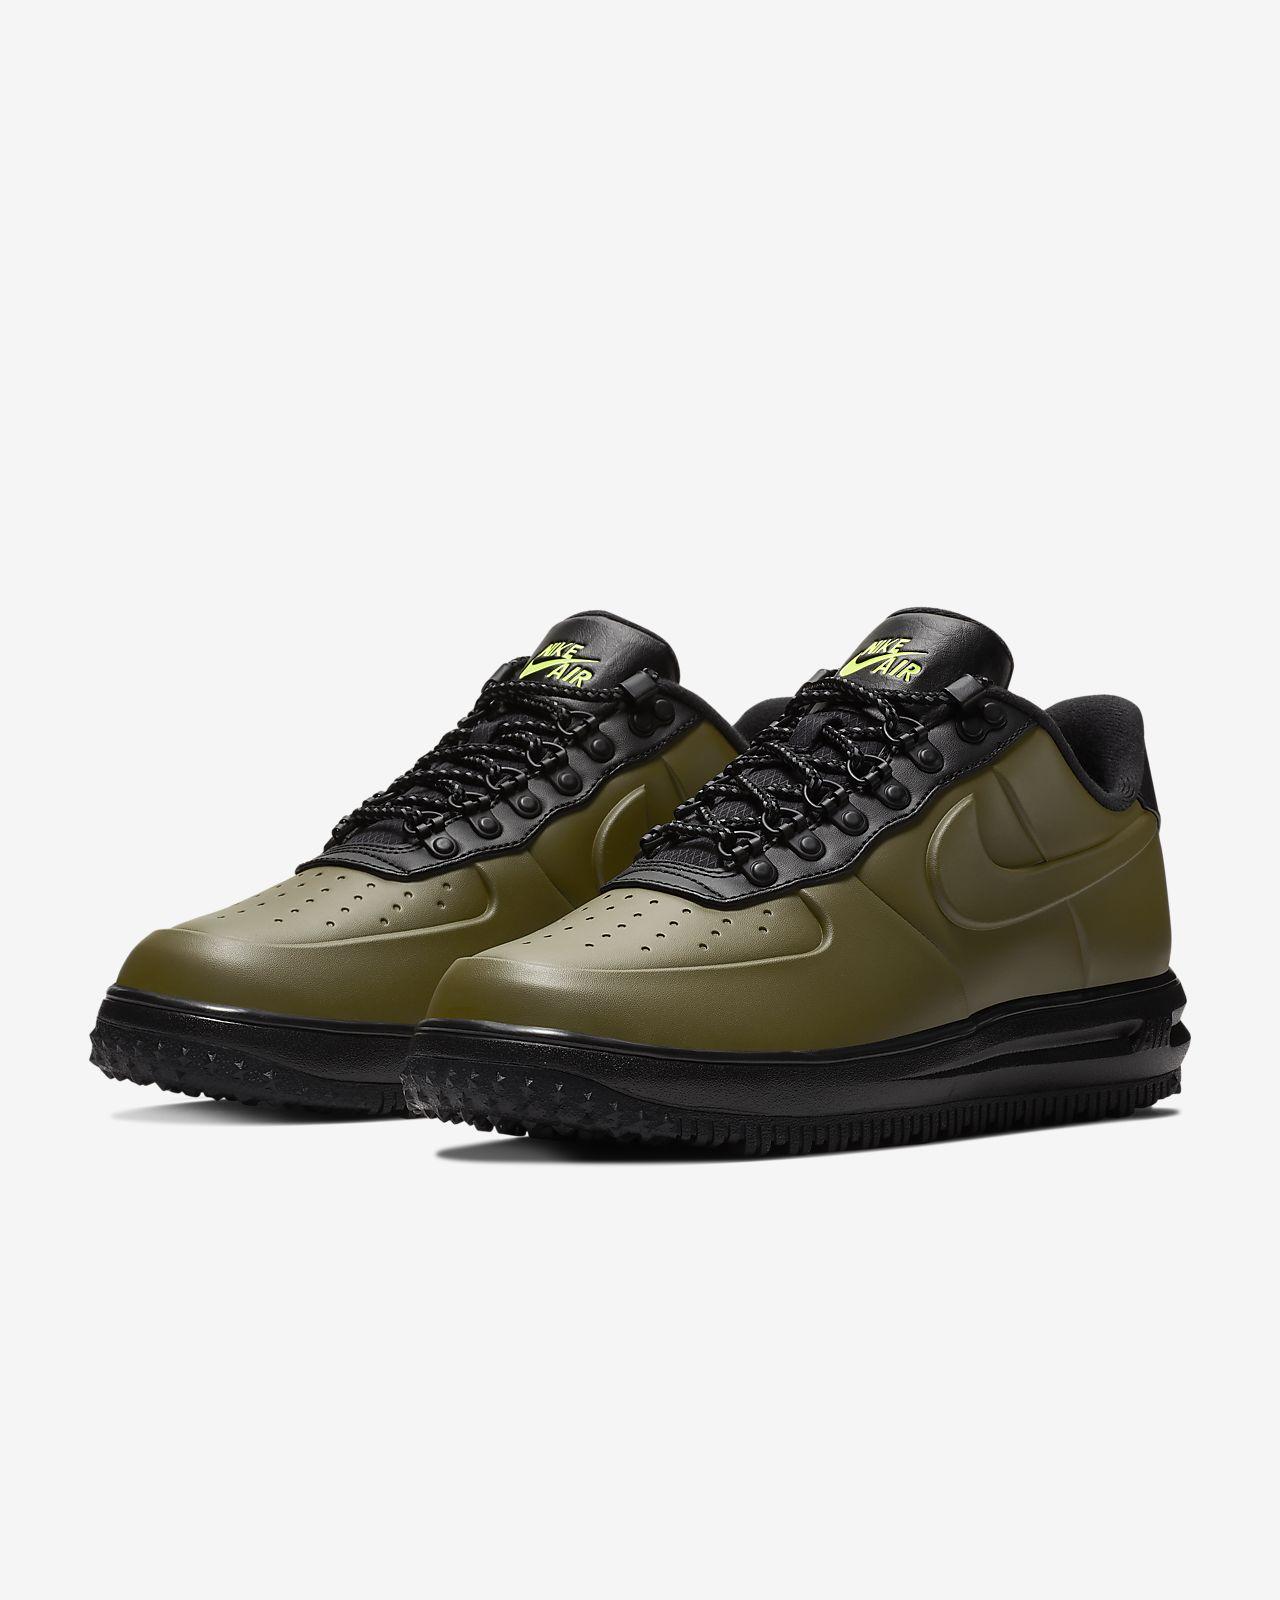 7948f5590991 Nike Lunar Force 1 Duckboot Low Men s Shoe. Nike.com GB